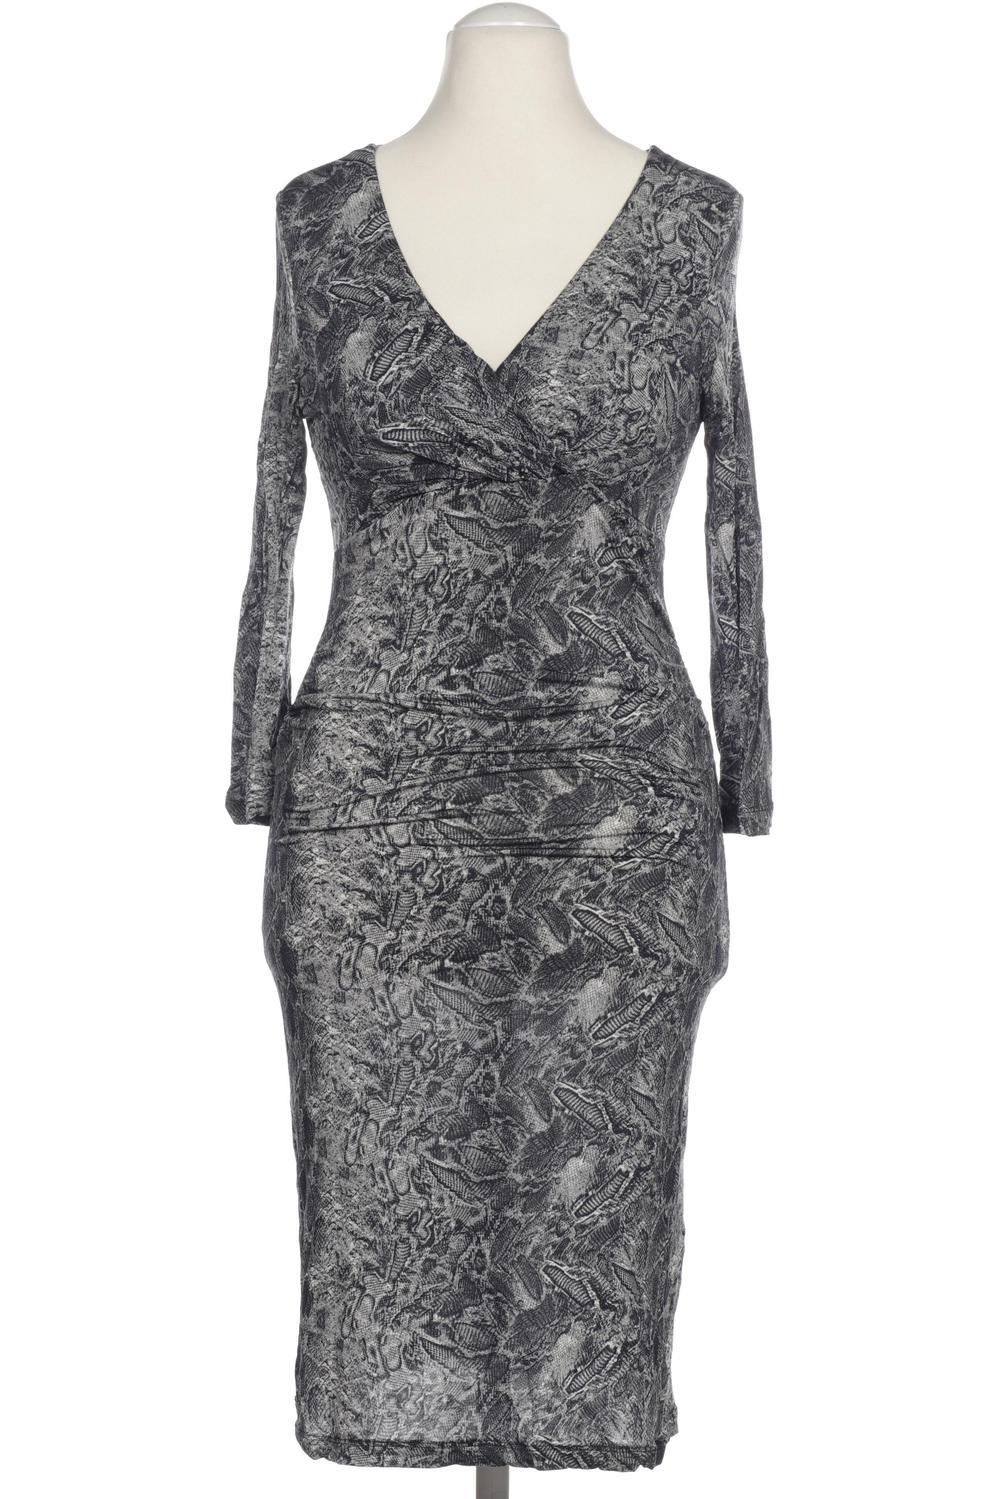 Orsay Kleid Damen Dress Damenkleid Gr. M Elasthan, Viskose ...